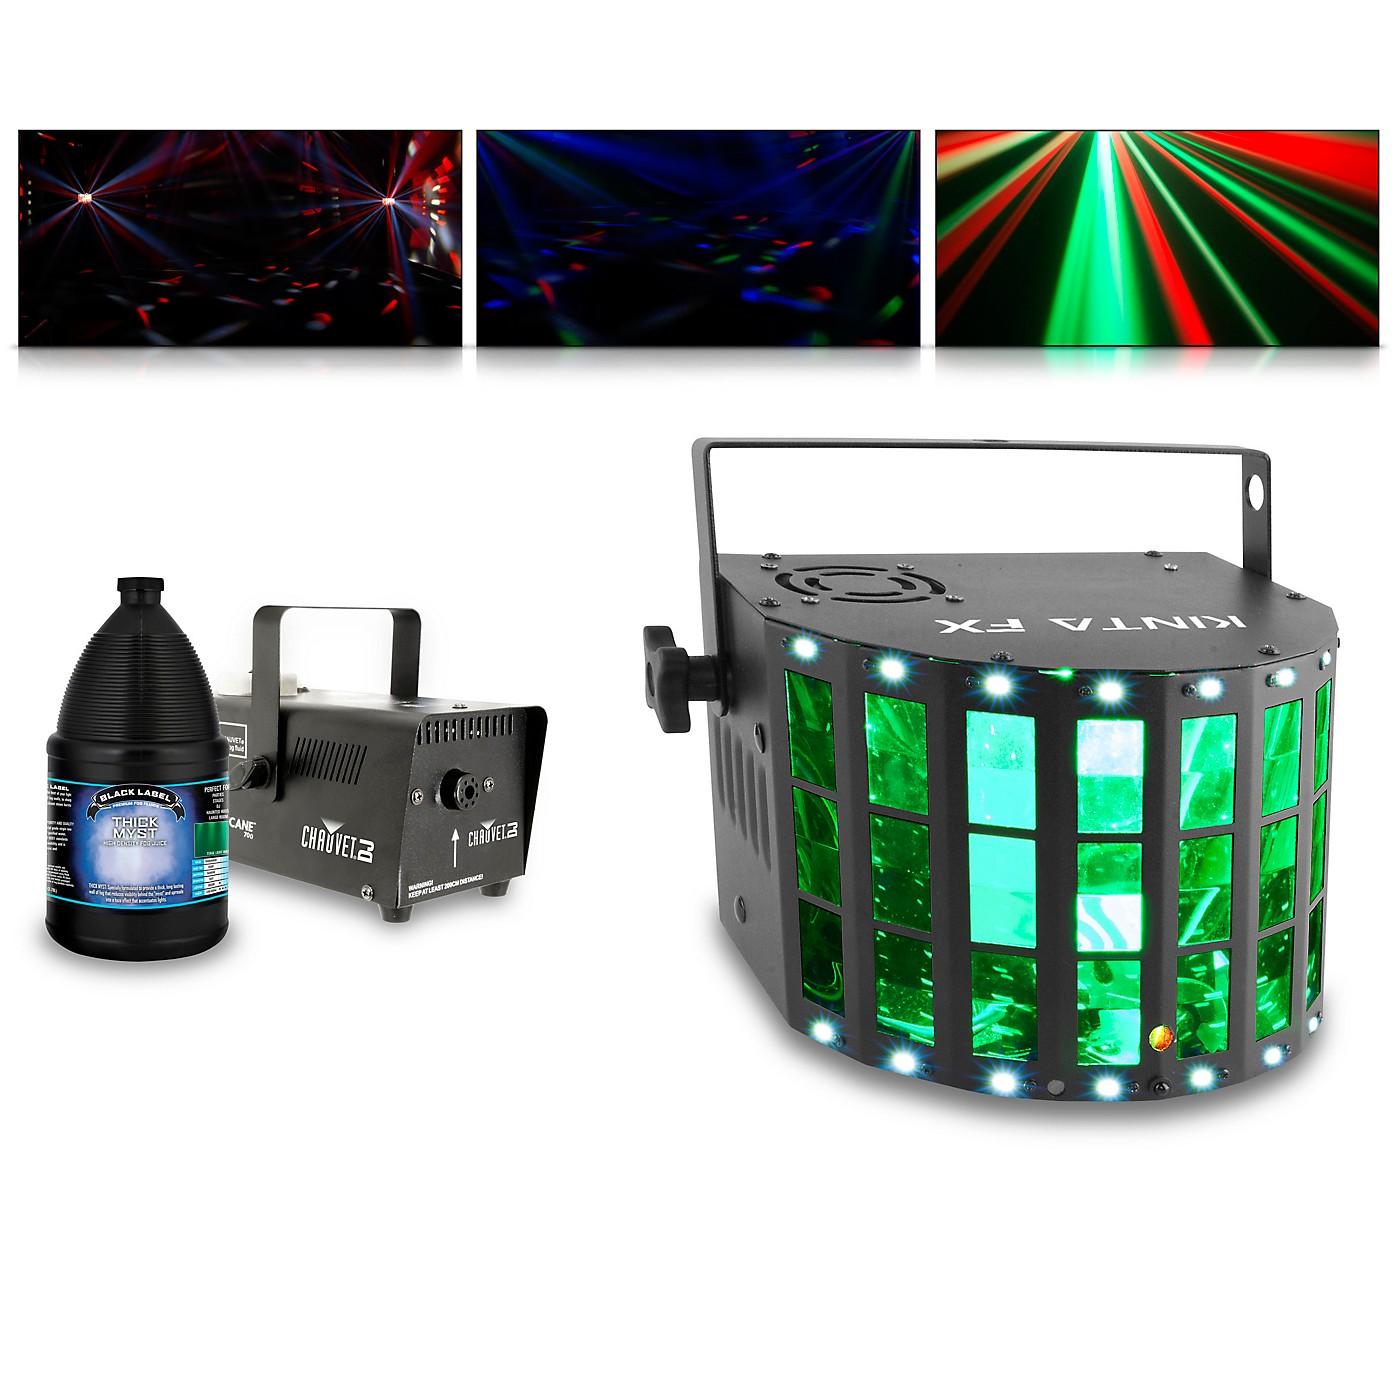 CHAUVET DJ KINTA FX with Hurricane 700 Fog Machine and Juice thumbnail